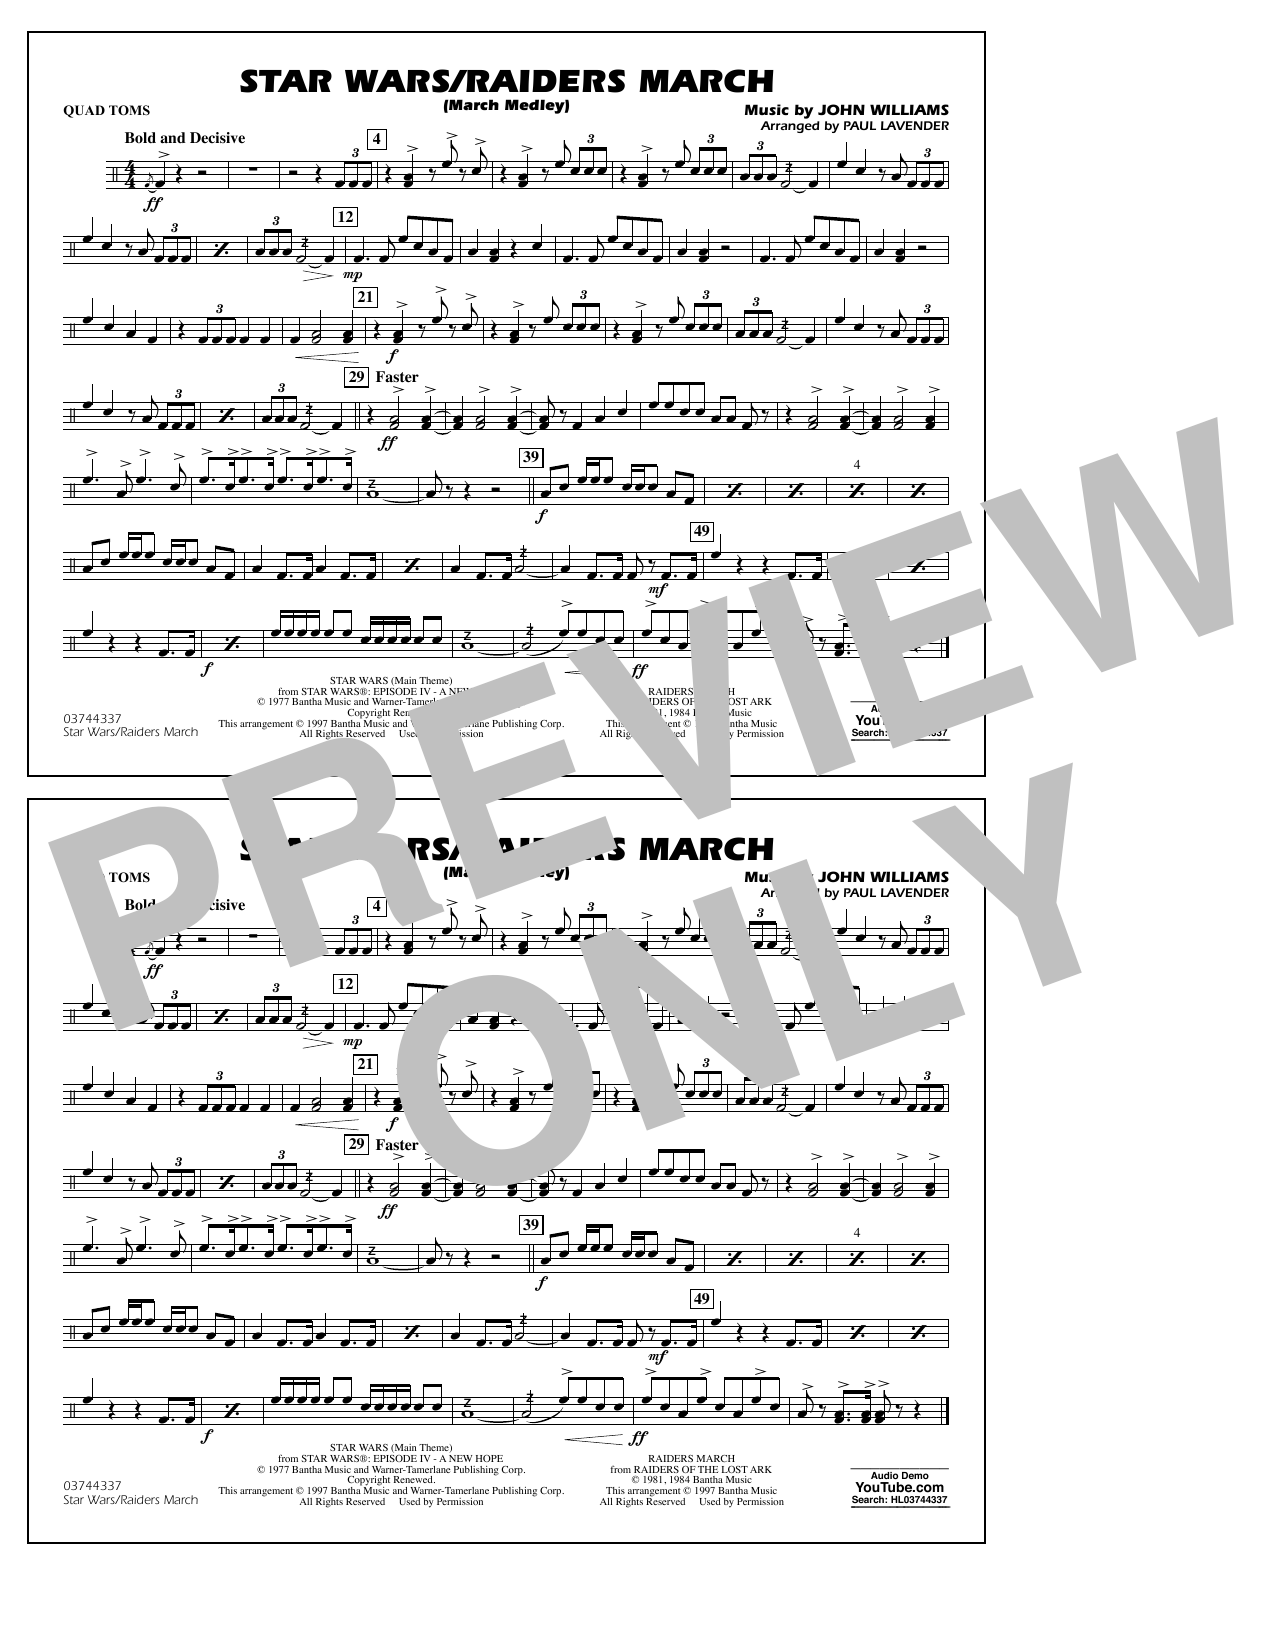 Star Wars/Raiders March - Quad Toms Sheet Music